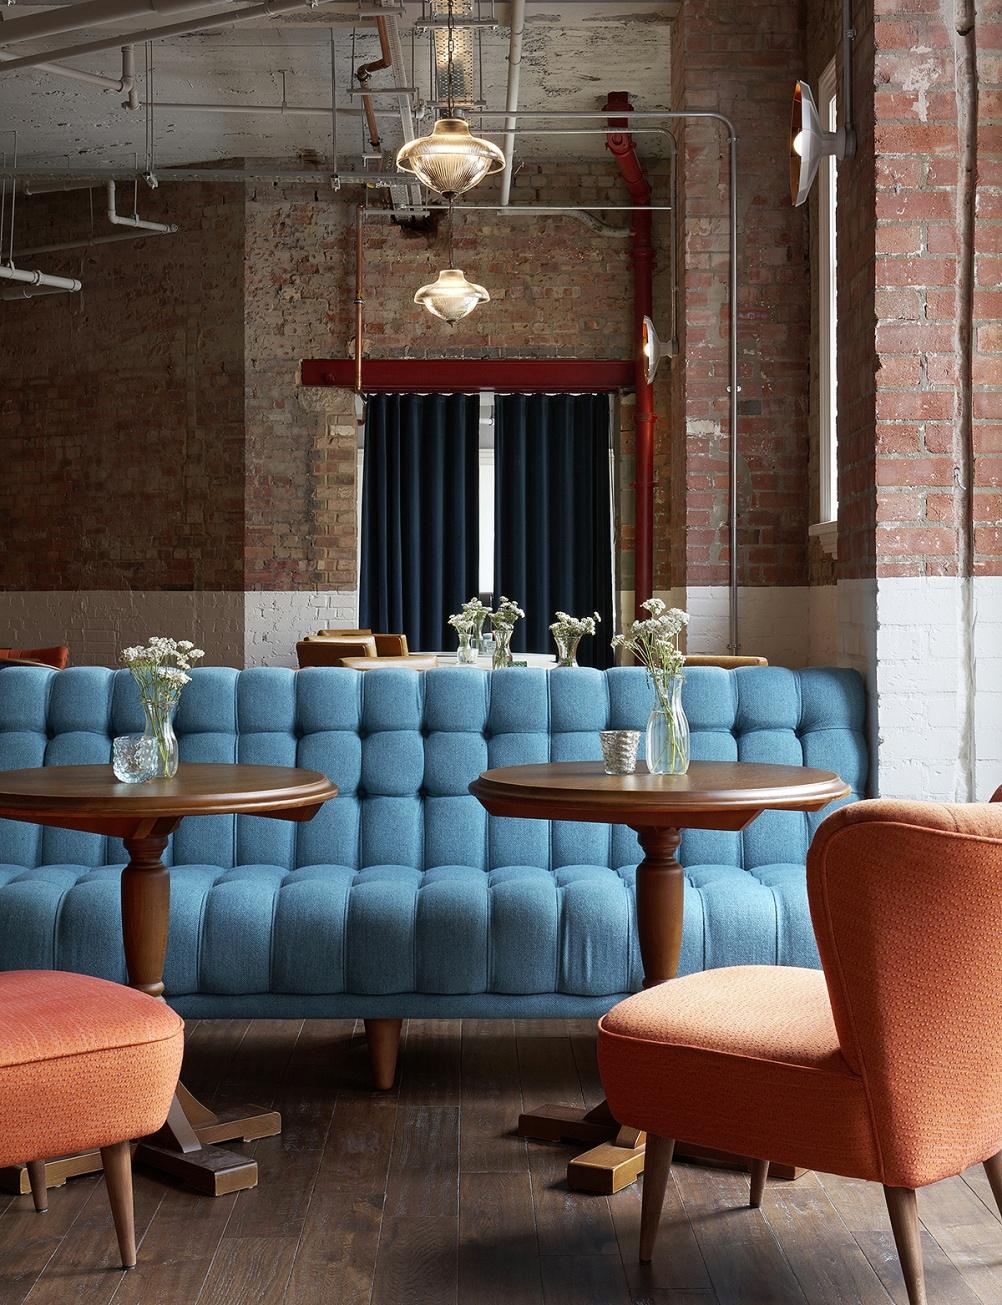 Picturehouse central interiors by martin brudnizki design for Interior designers central london